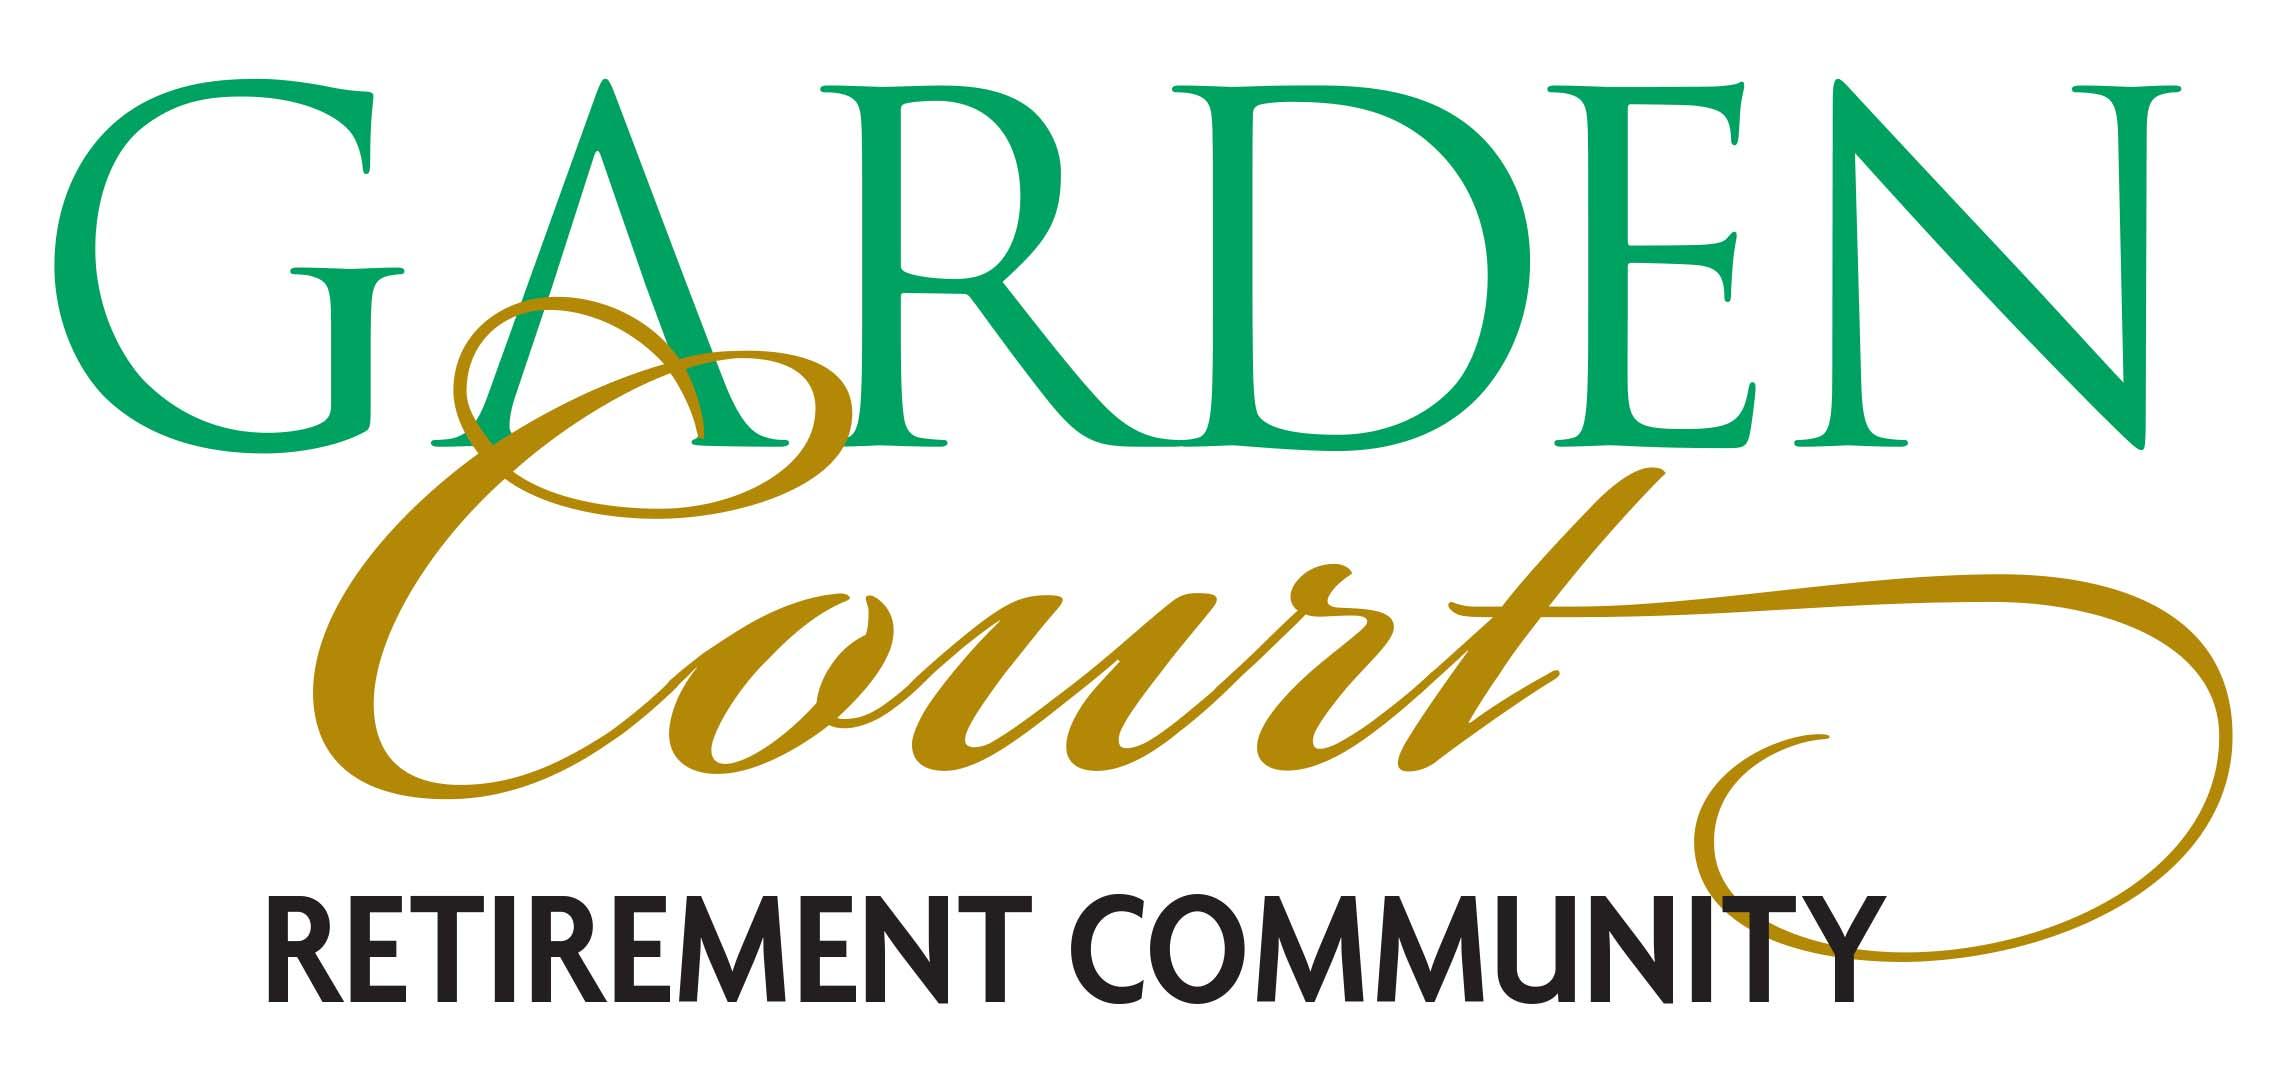 Garden Court logo